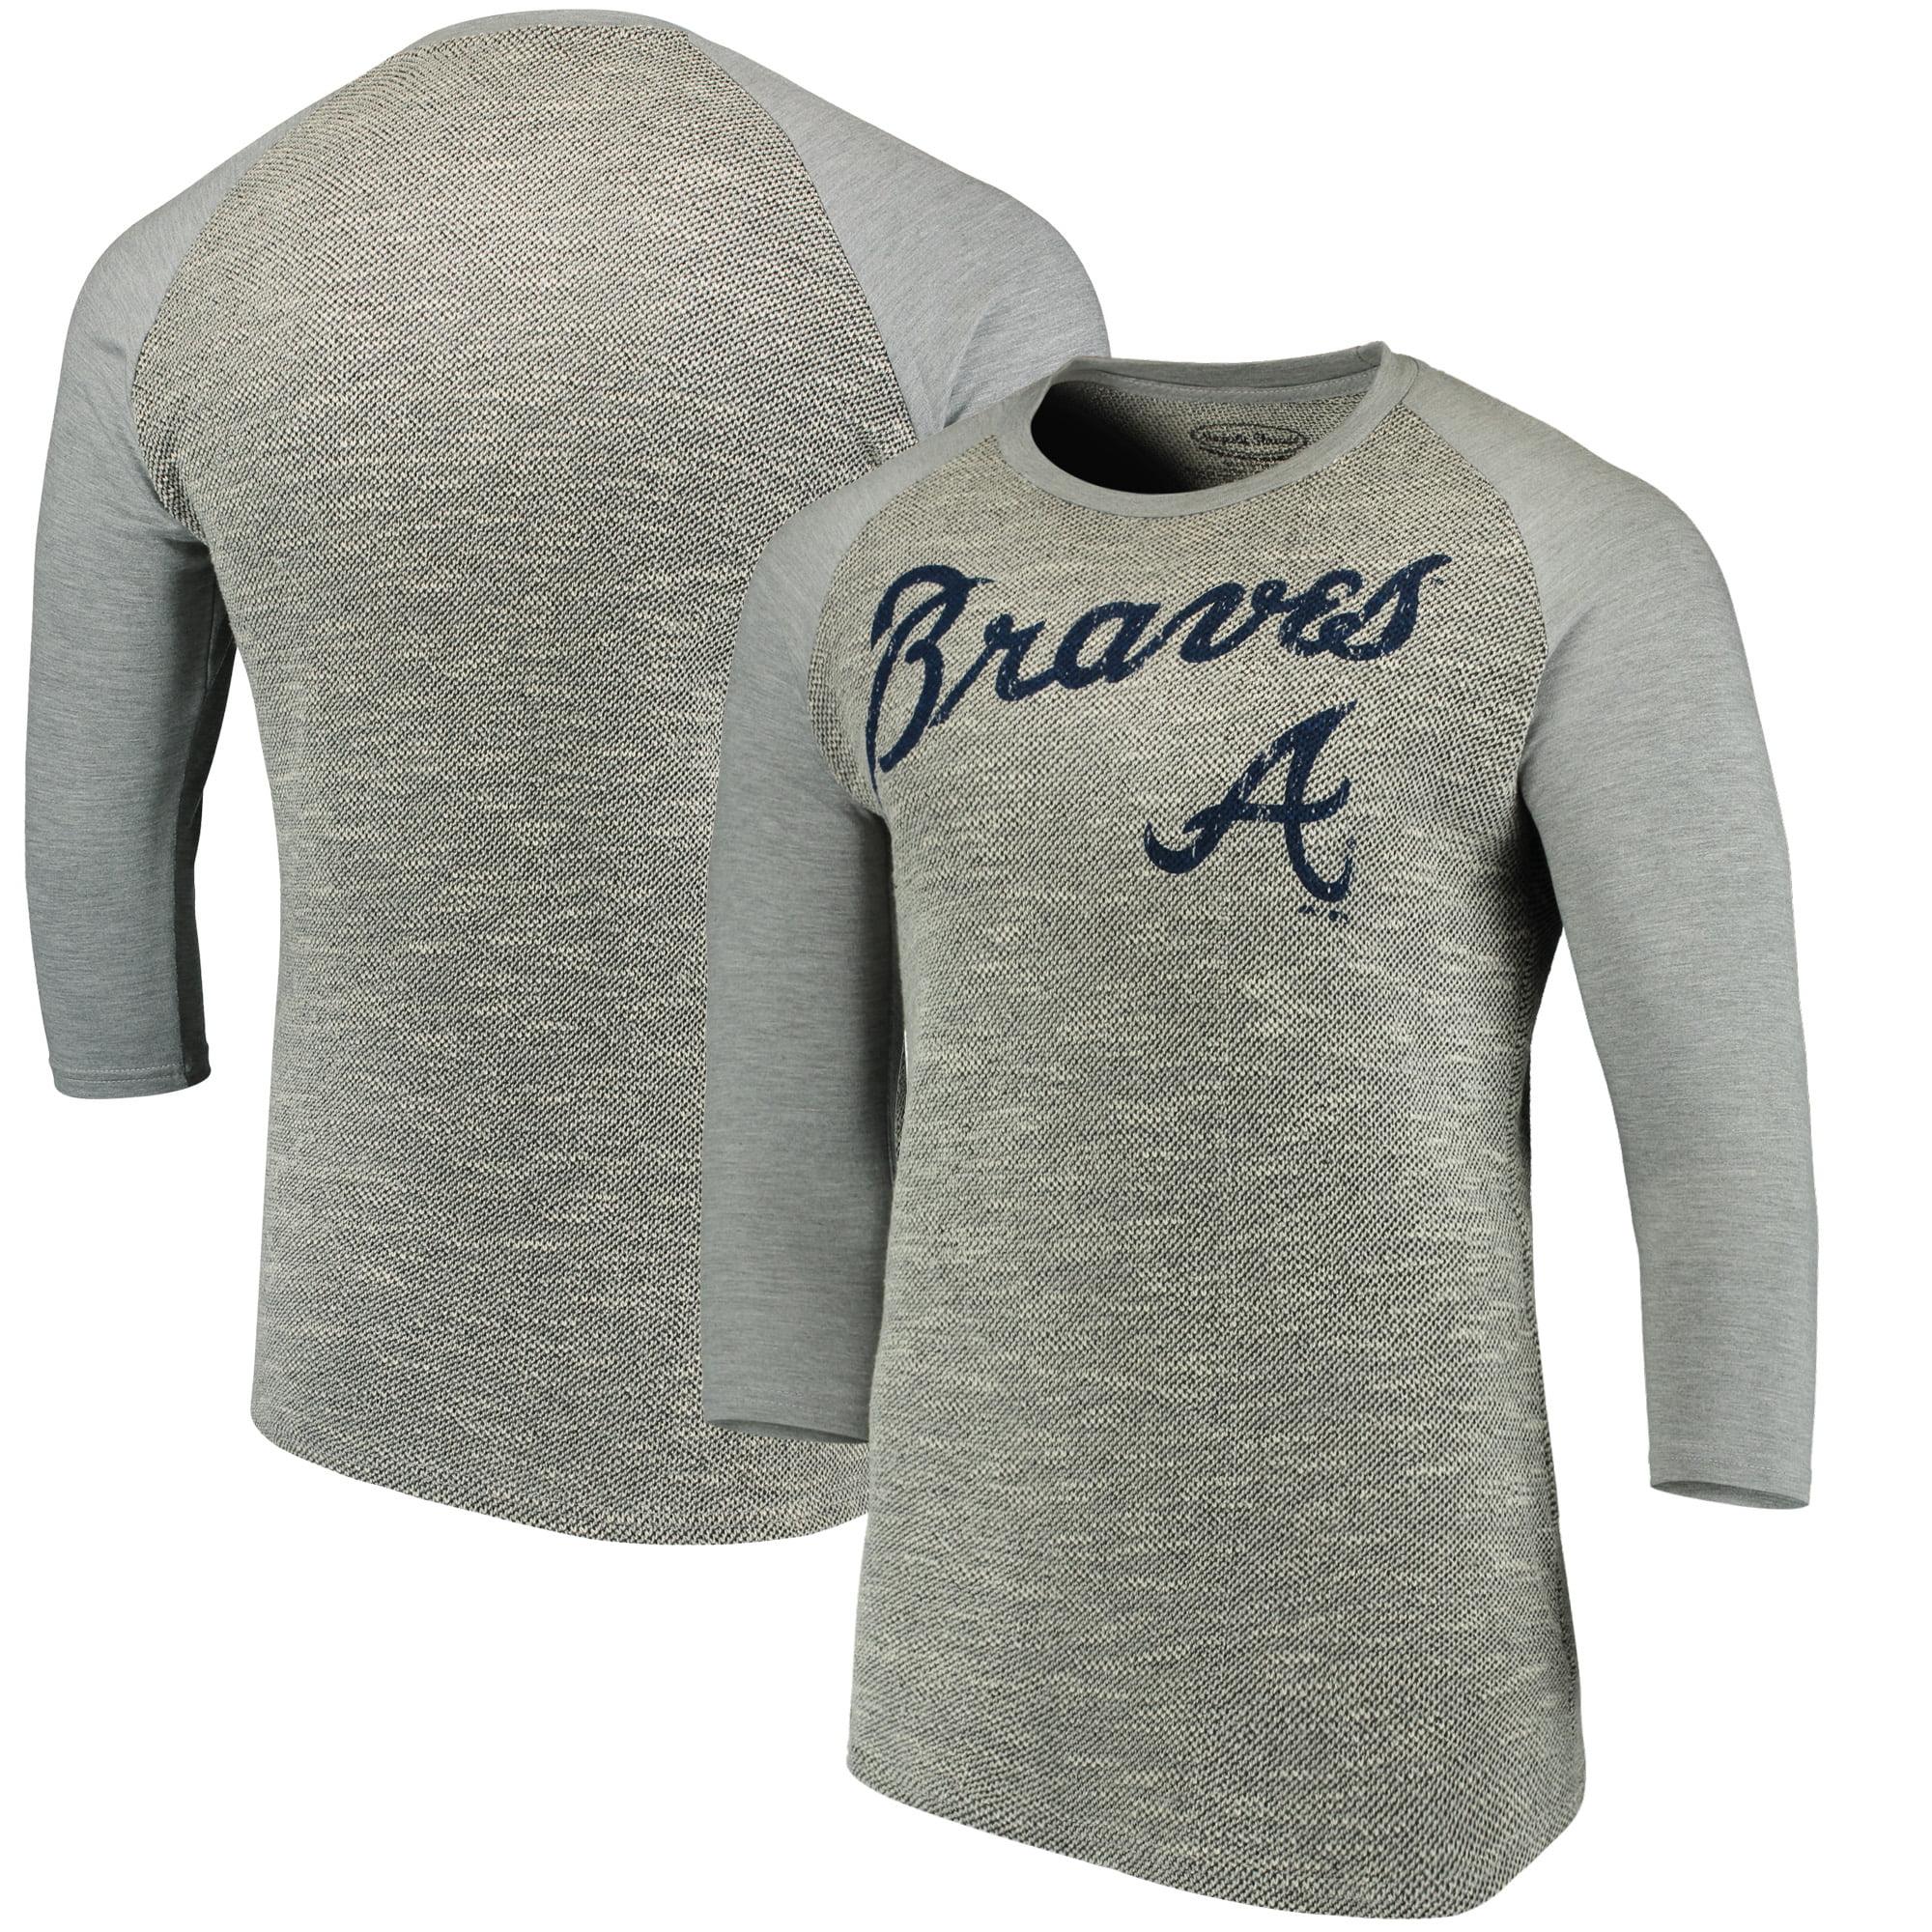 Atlanta Braves Majestic Threads Tri-Yarn French Terry 3/4-Sleeve Raglan T-Shirt - Gray